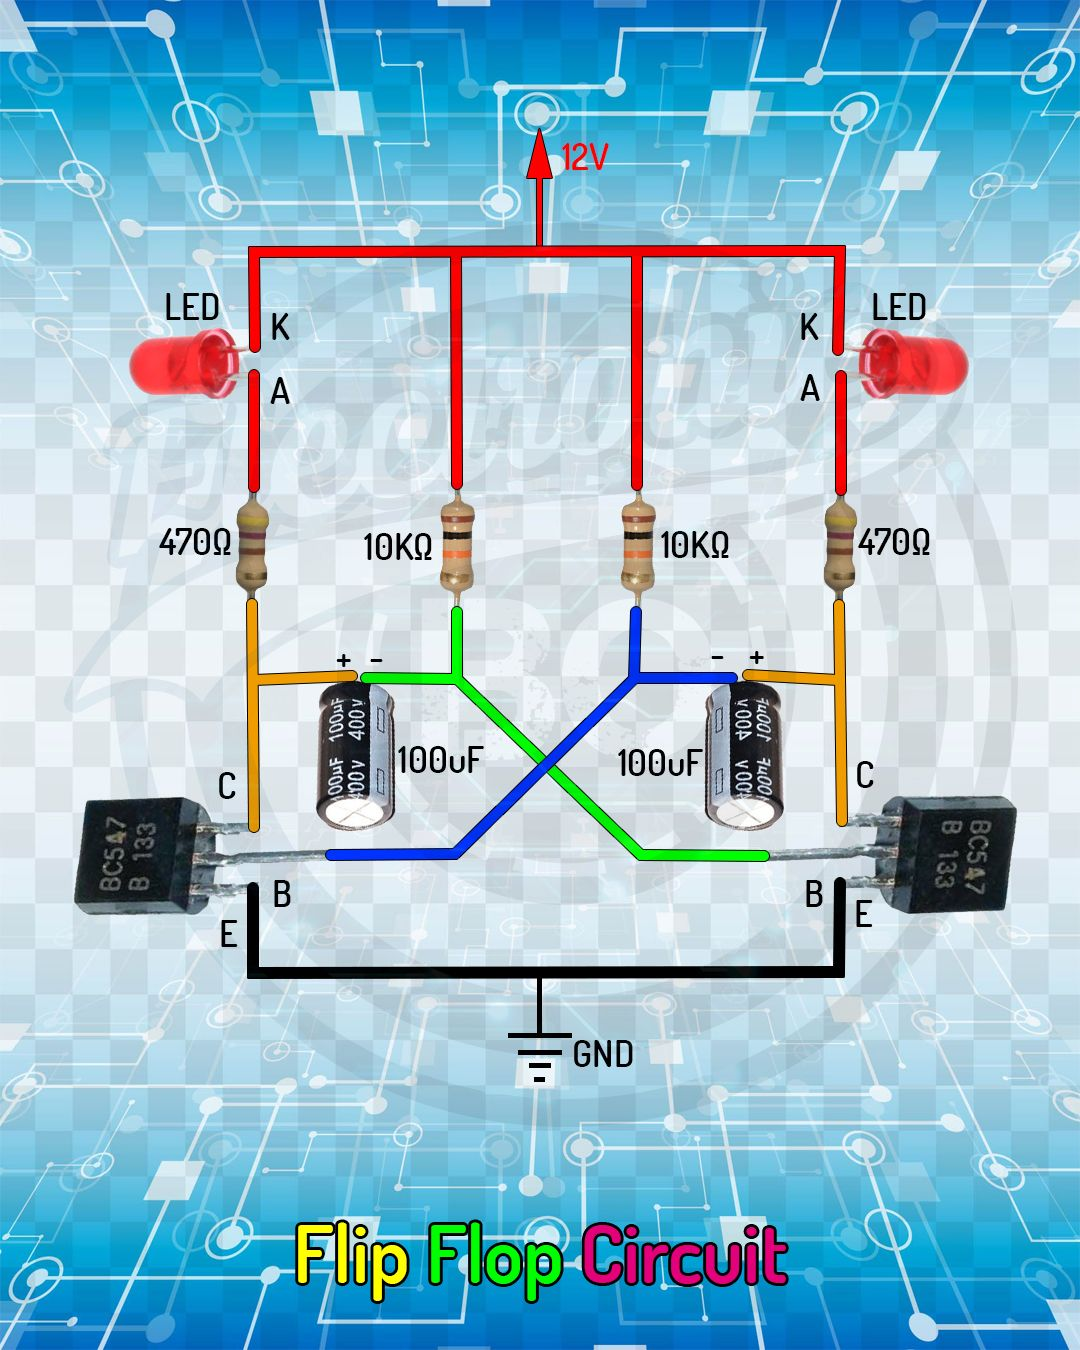 hight resolution of flip flop circuit